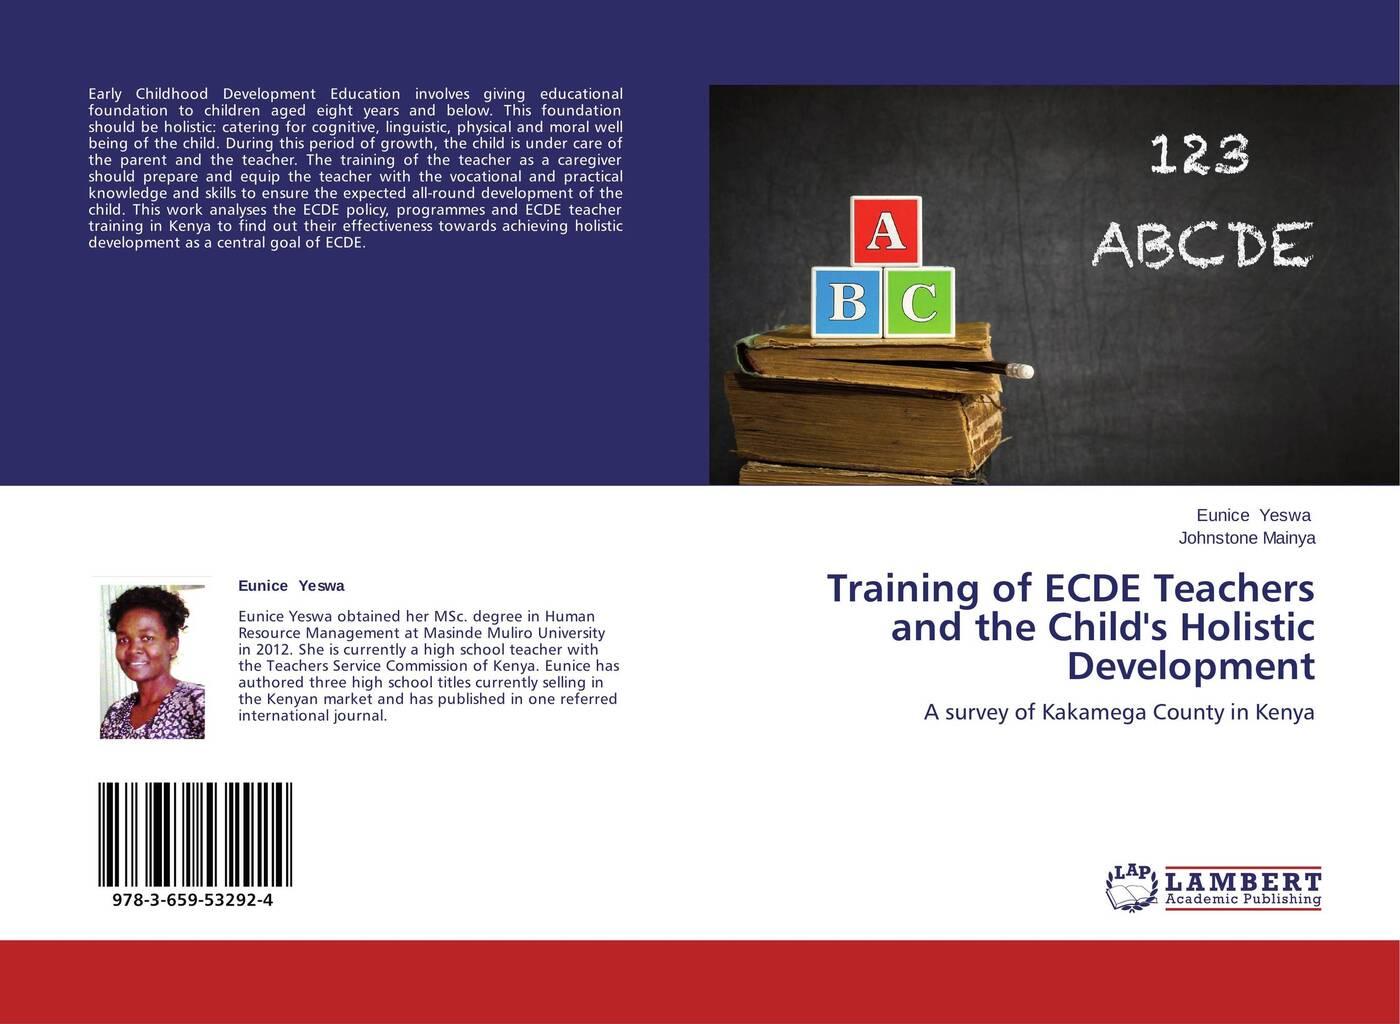 лучшая цена Eunice Yeswa and Johnstone Mainya Training of ECDE Teachers and the Child's Holistic Development